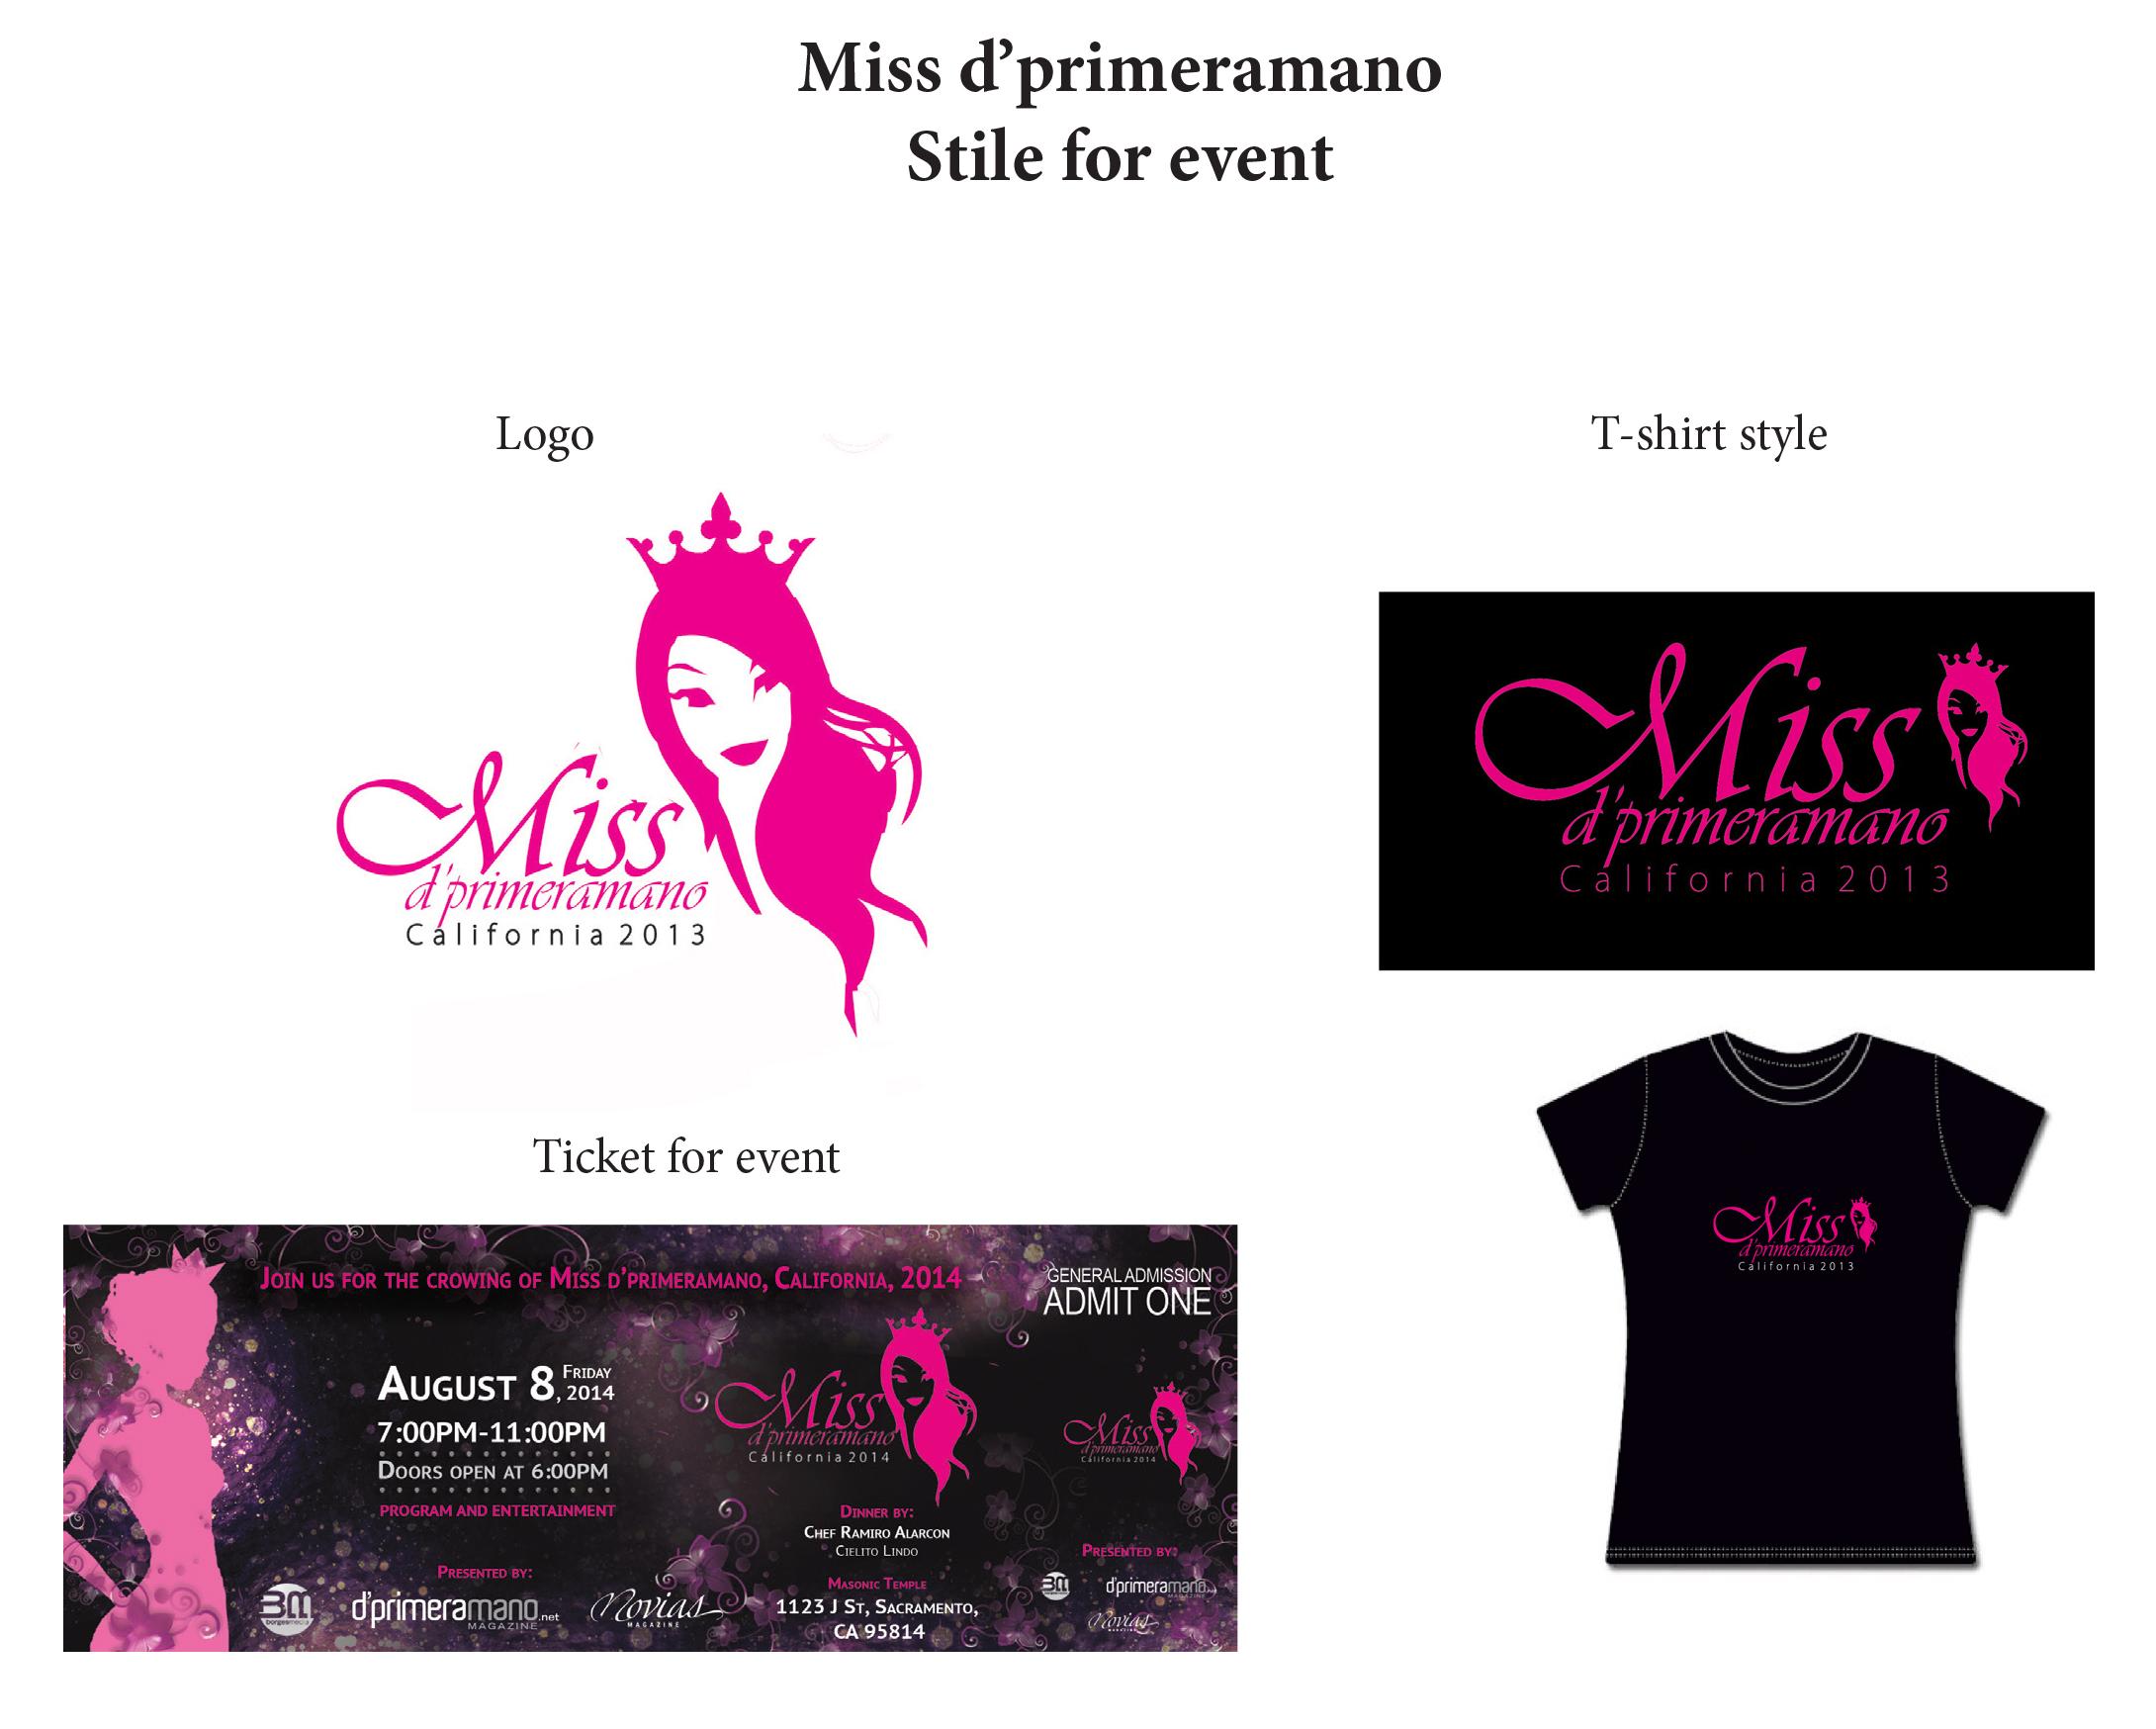 Stile for Miss Dprimeramano